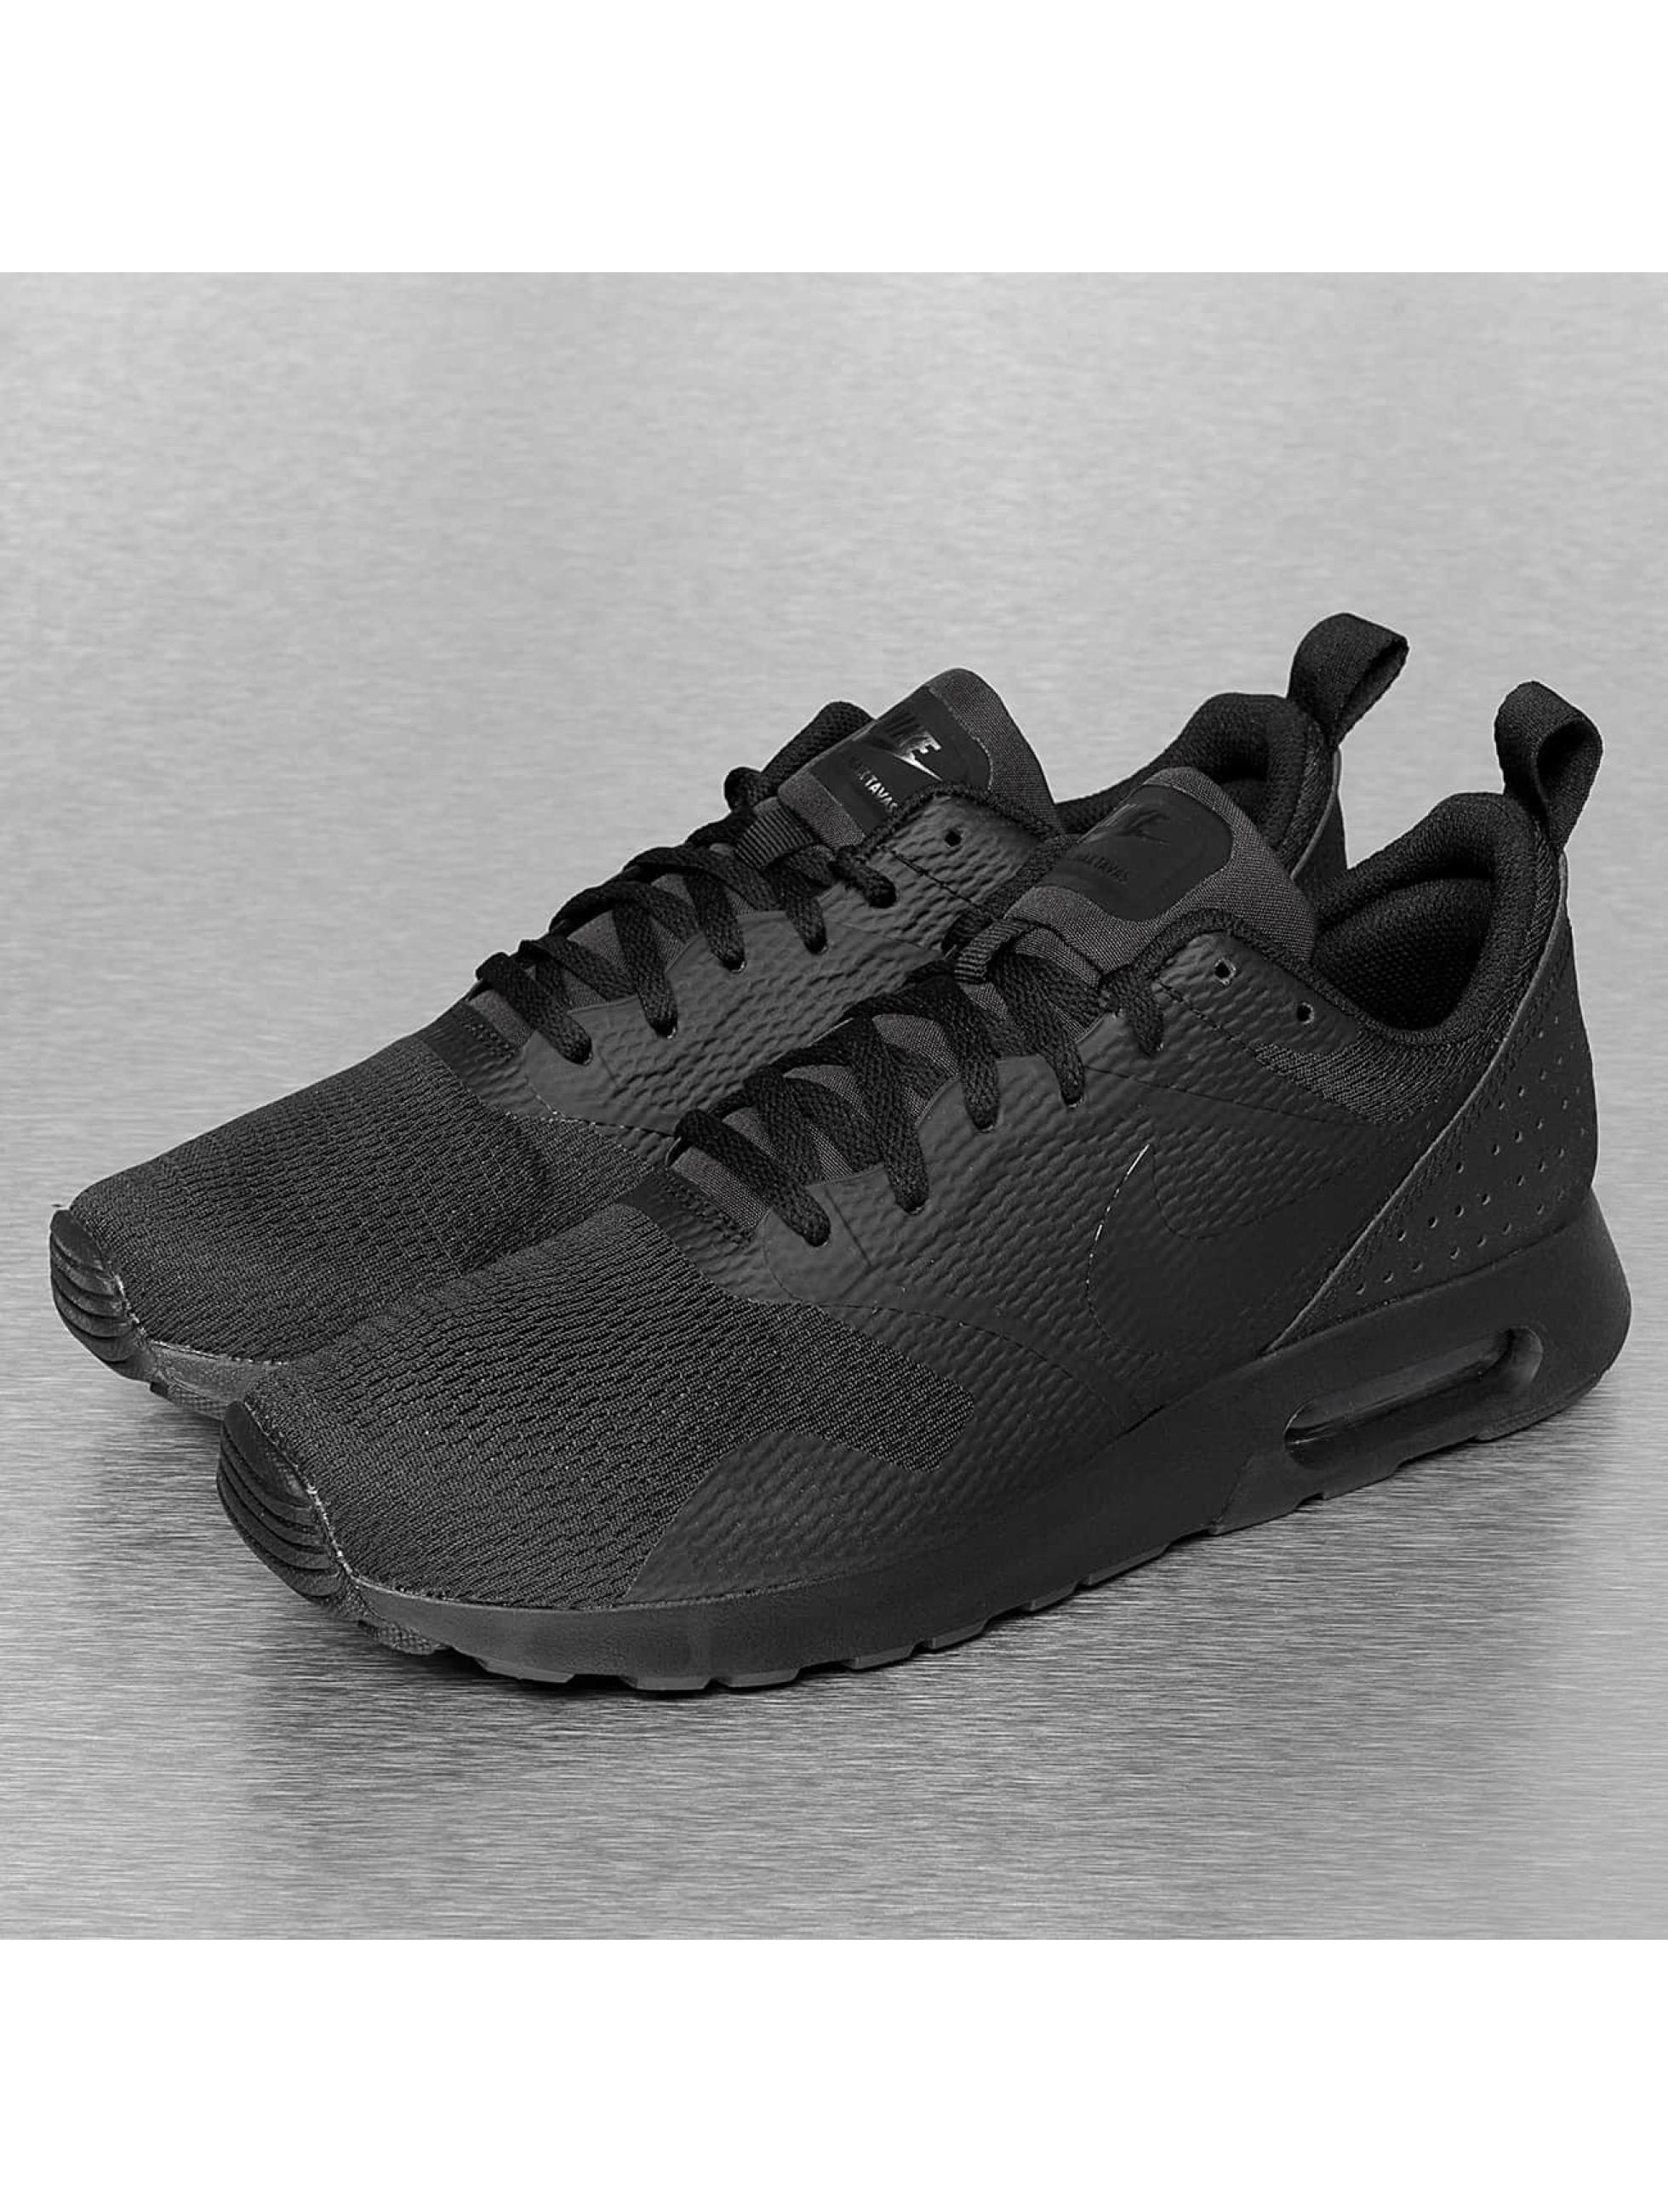 Nike Air Max Tavas Weiß Schwarz